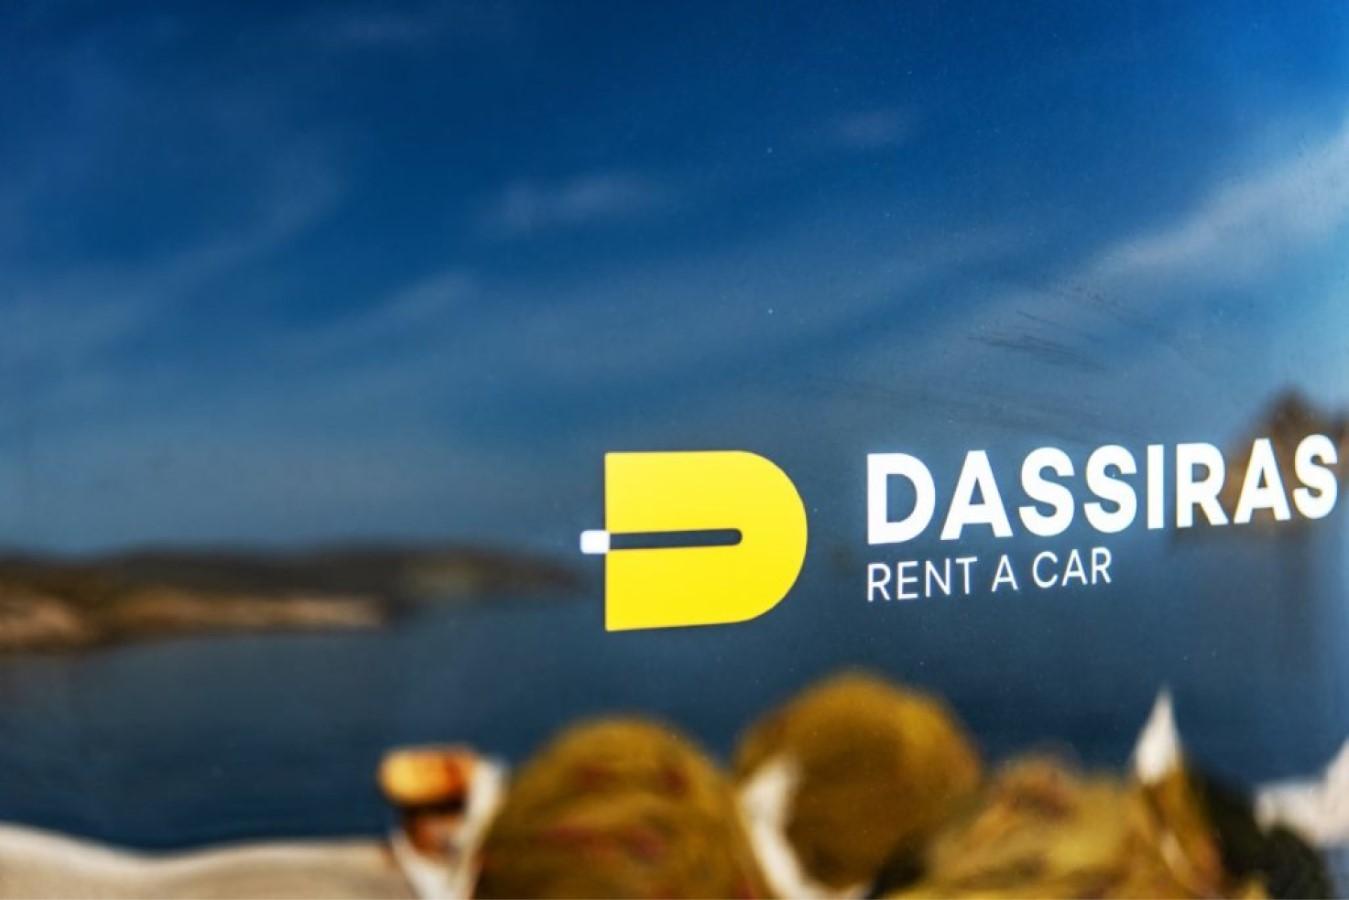 dassiras-info (Custom)